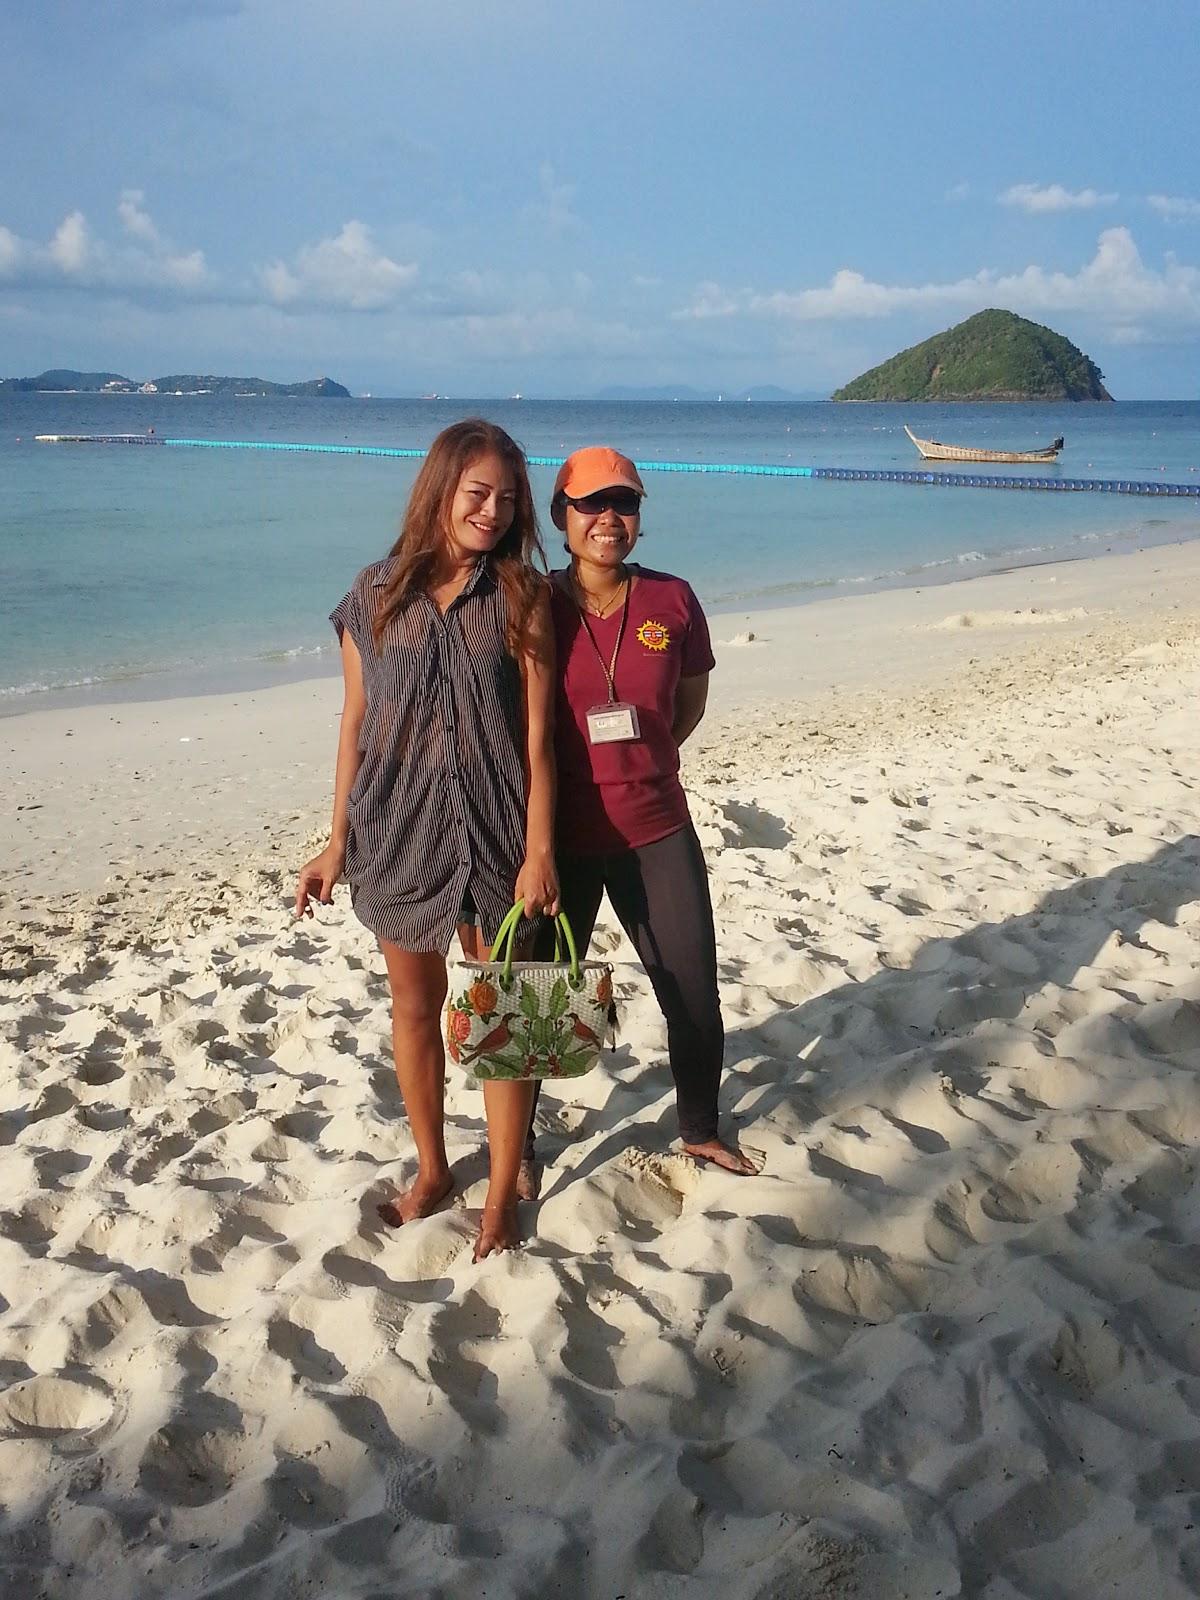 Coral island - Phuket